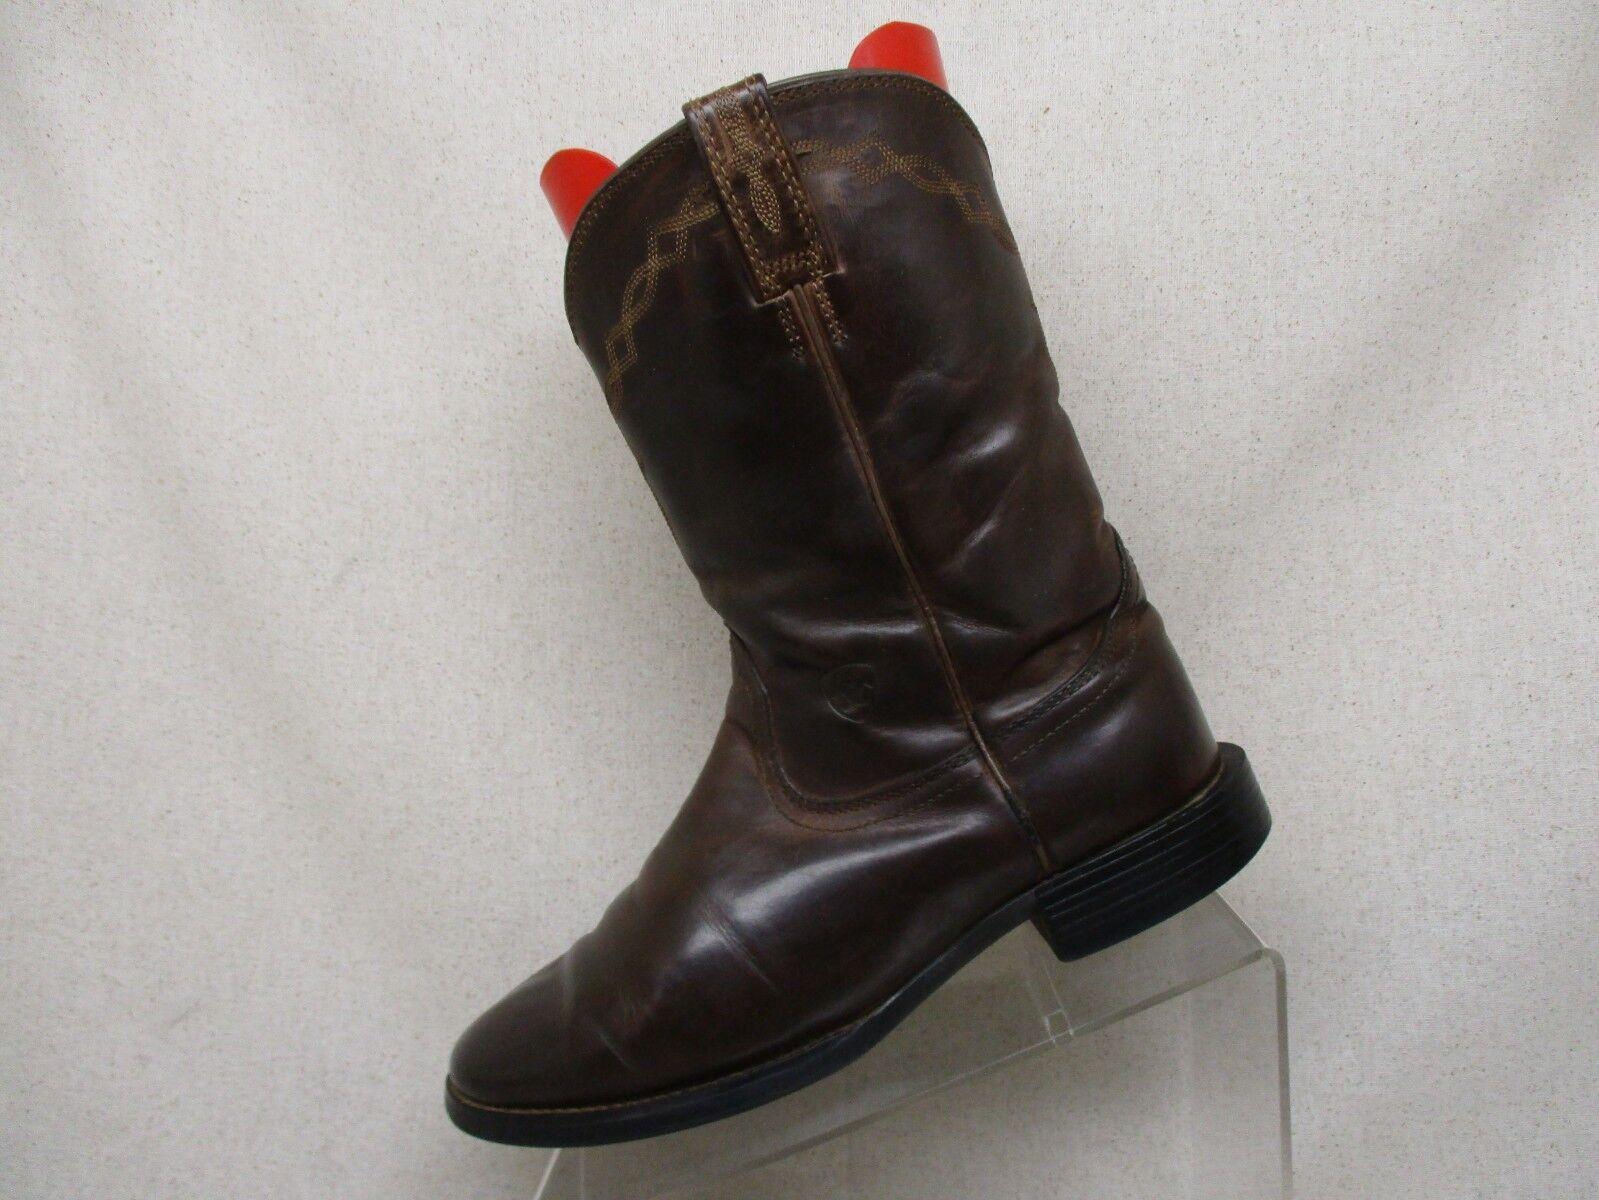 Ariat en cuir marron Roper Cowboy Western bottes Homme TAILLE 9 C style 14525